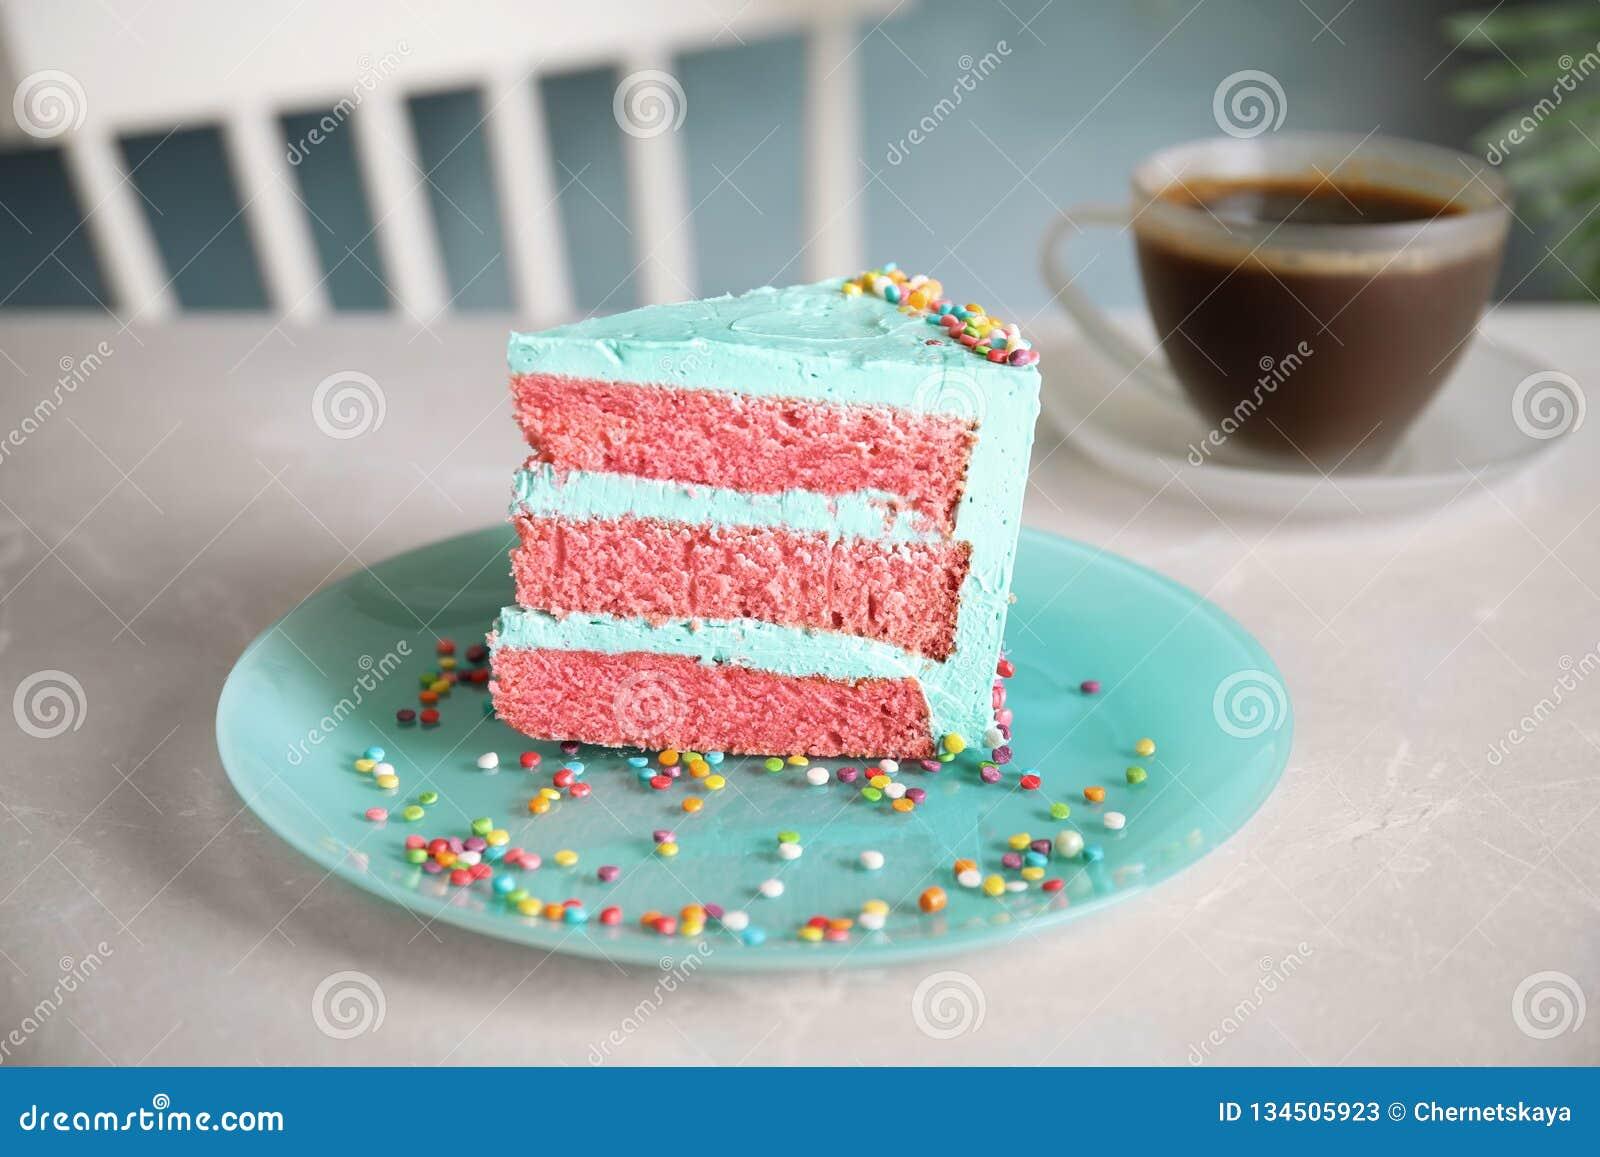 Slice Of Fresh Delicious Birthday Cake